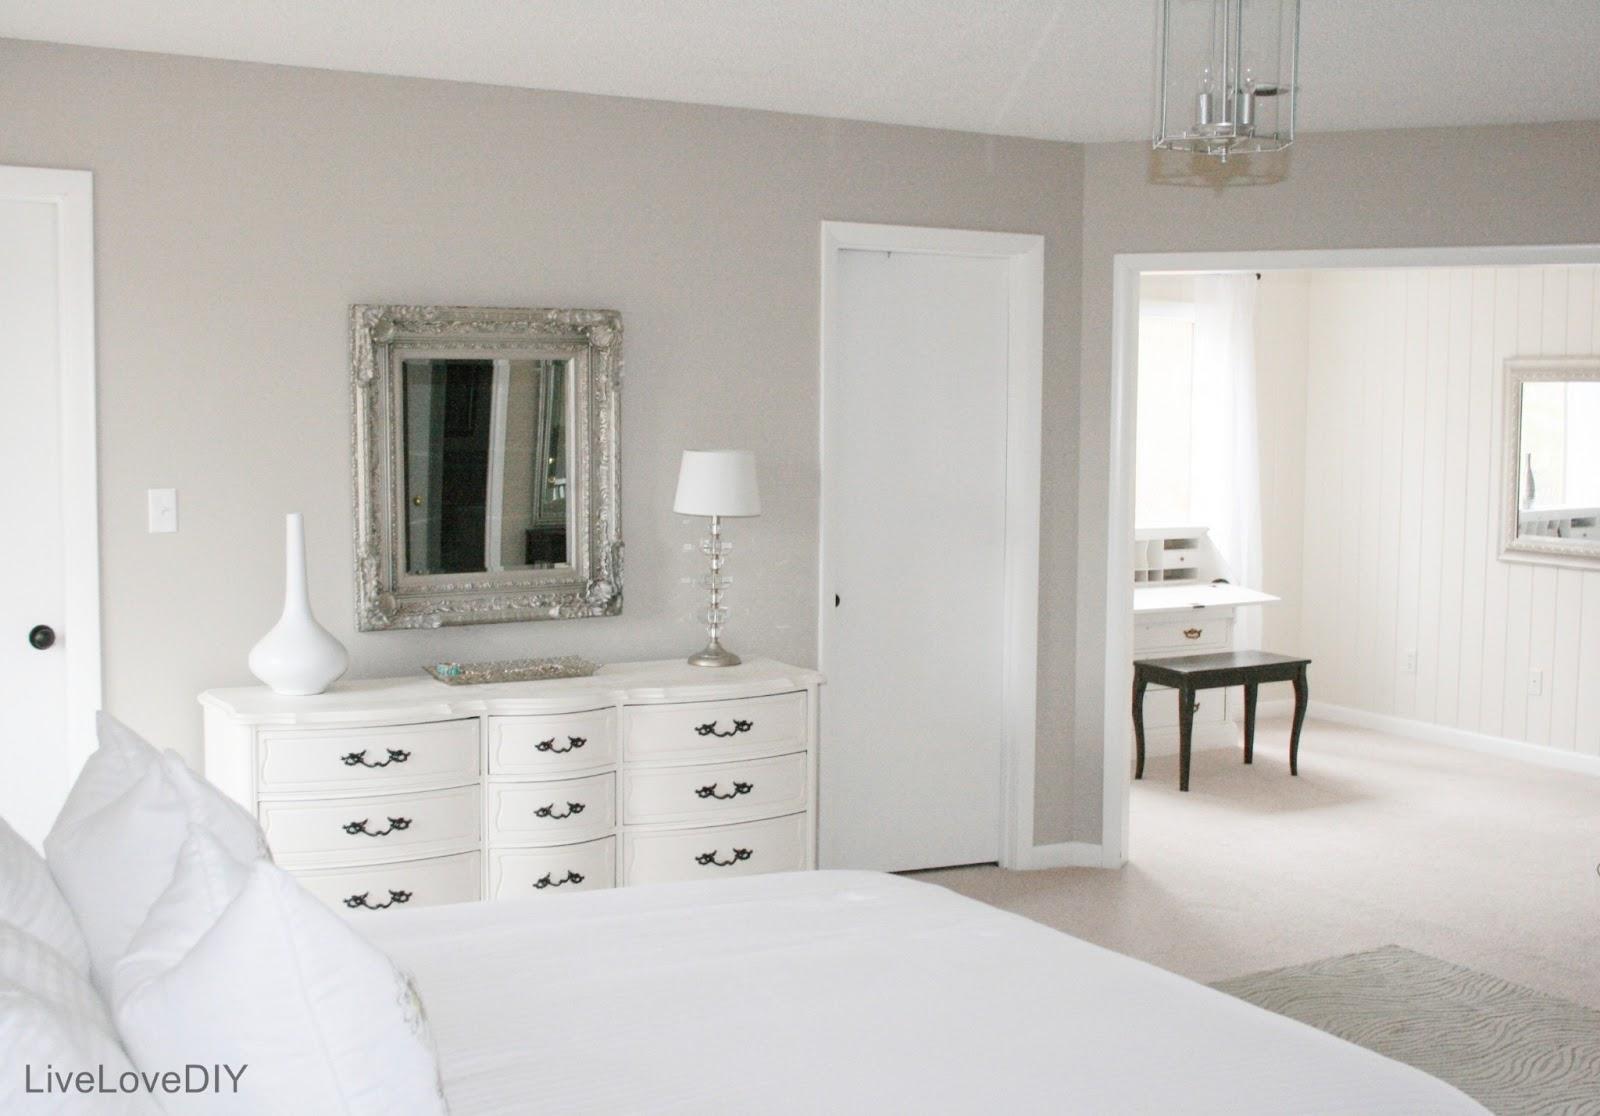 LiveLoveDIY How To Update Old Brass Fixtures - Update old bedroom furniture